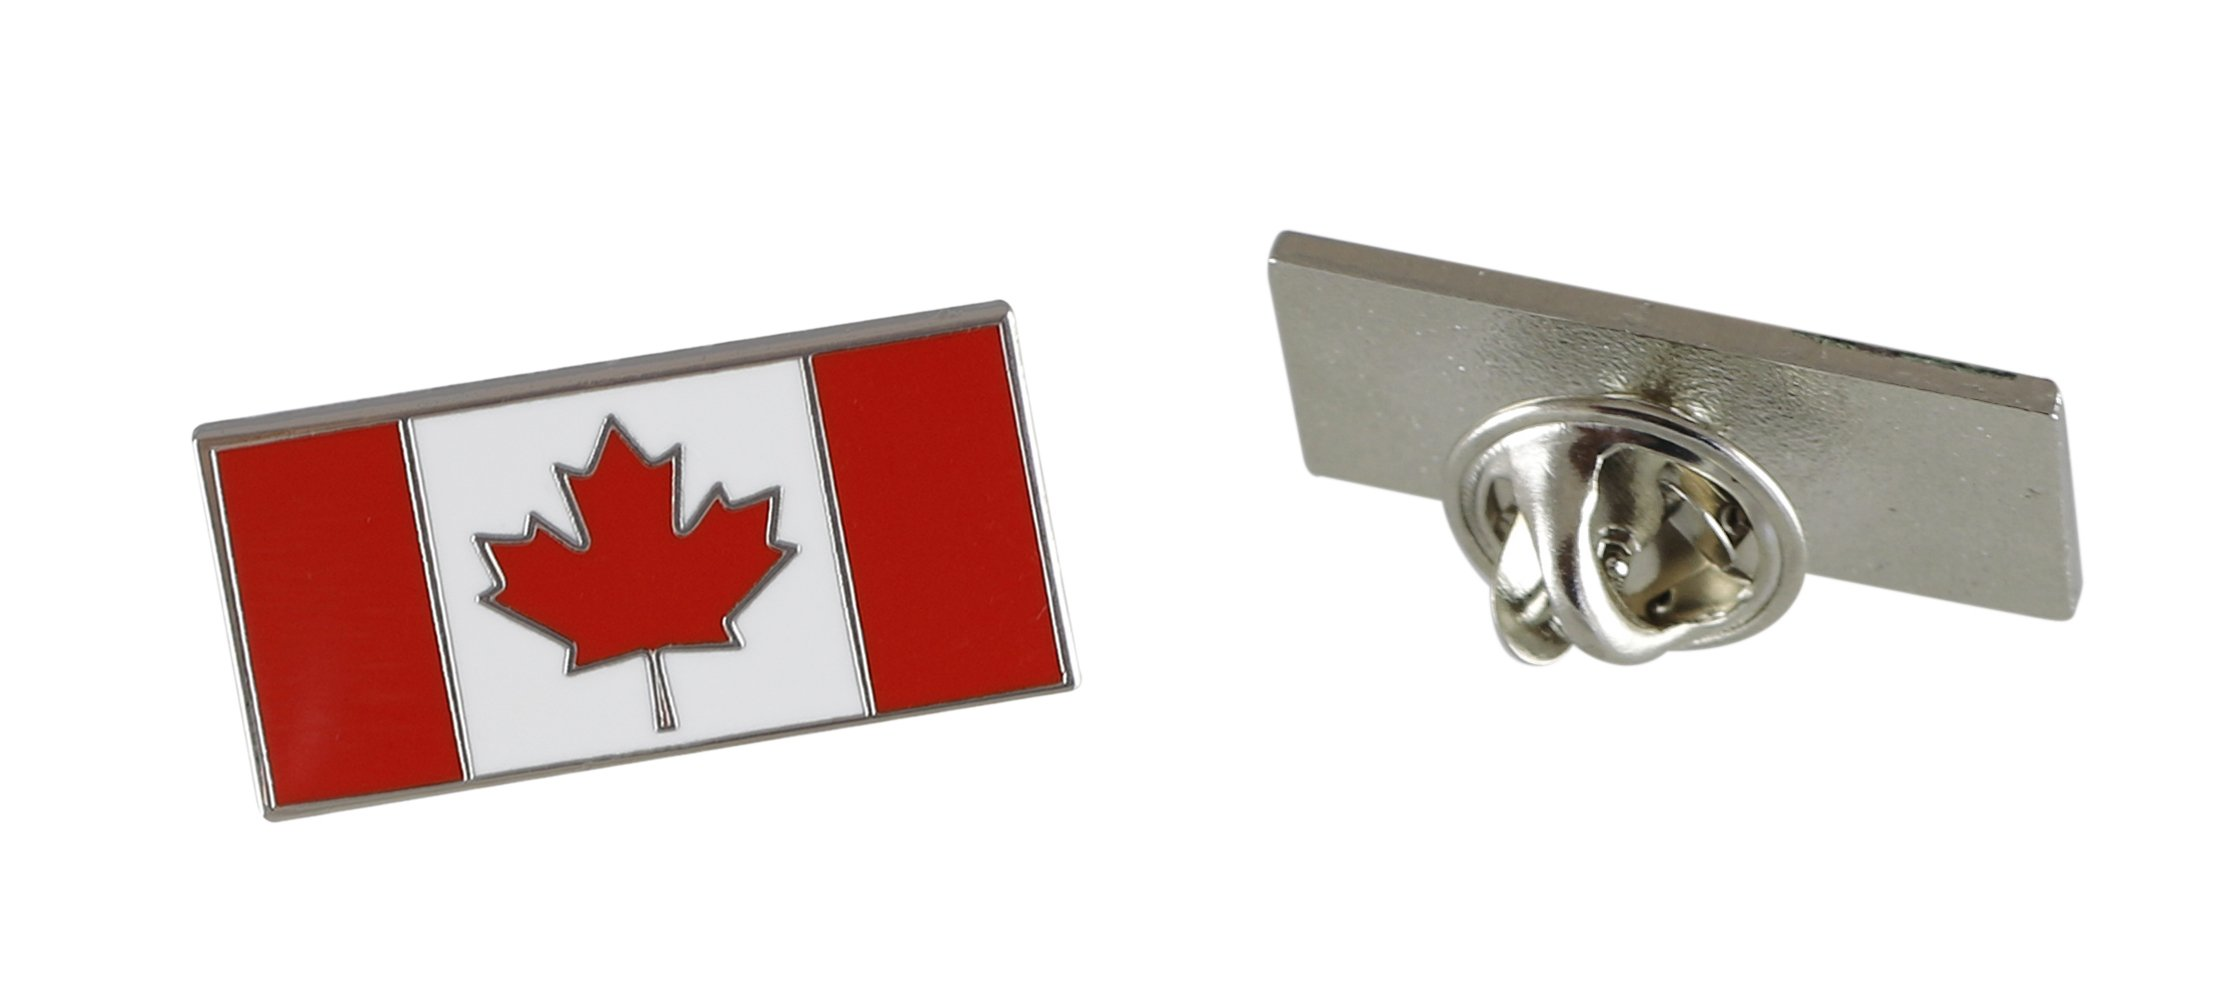 Forge Canadian Flag-Maple Leaf - Enamel Lapel Pins- Bulk (100 Pins) by Forge (Image #5)